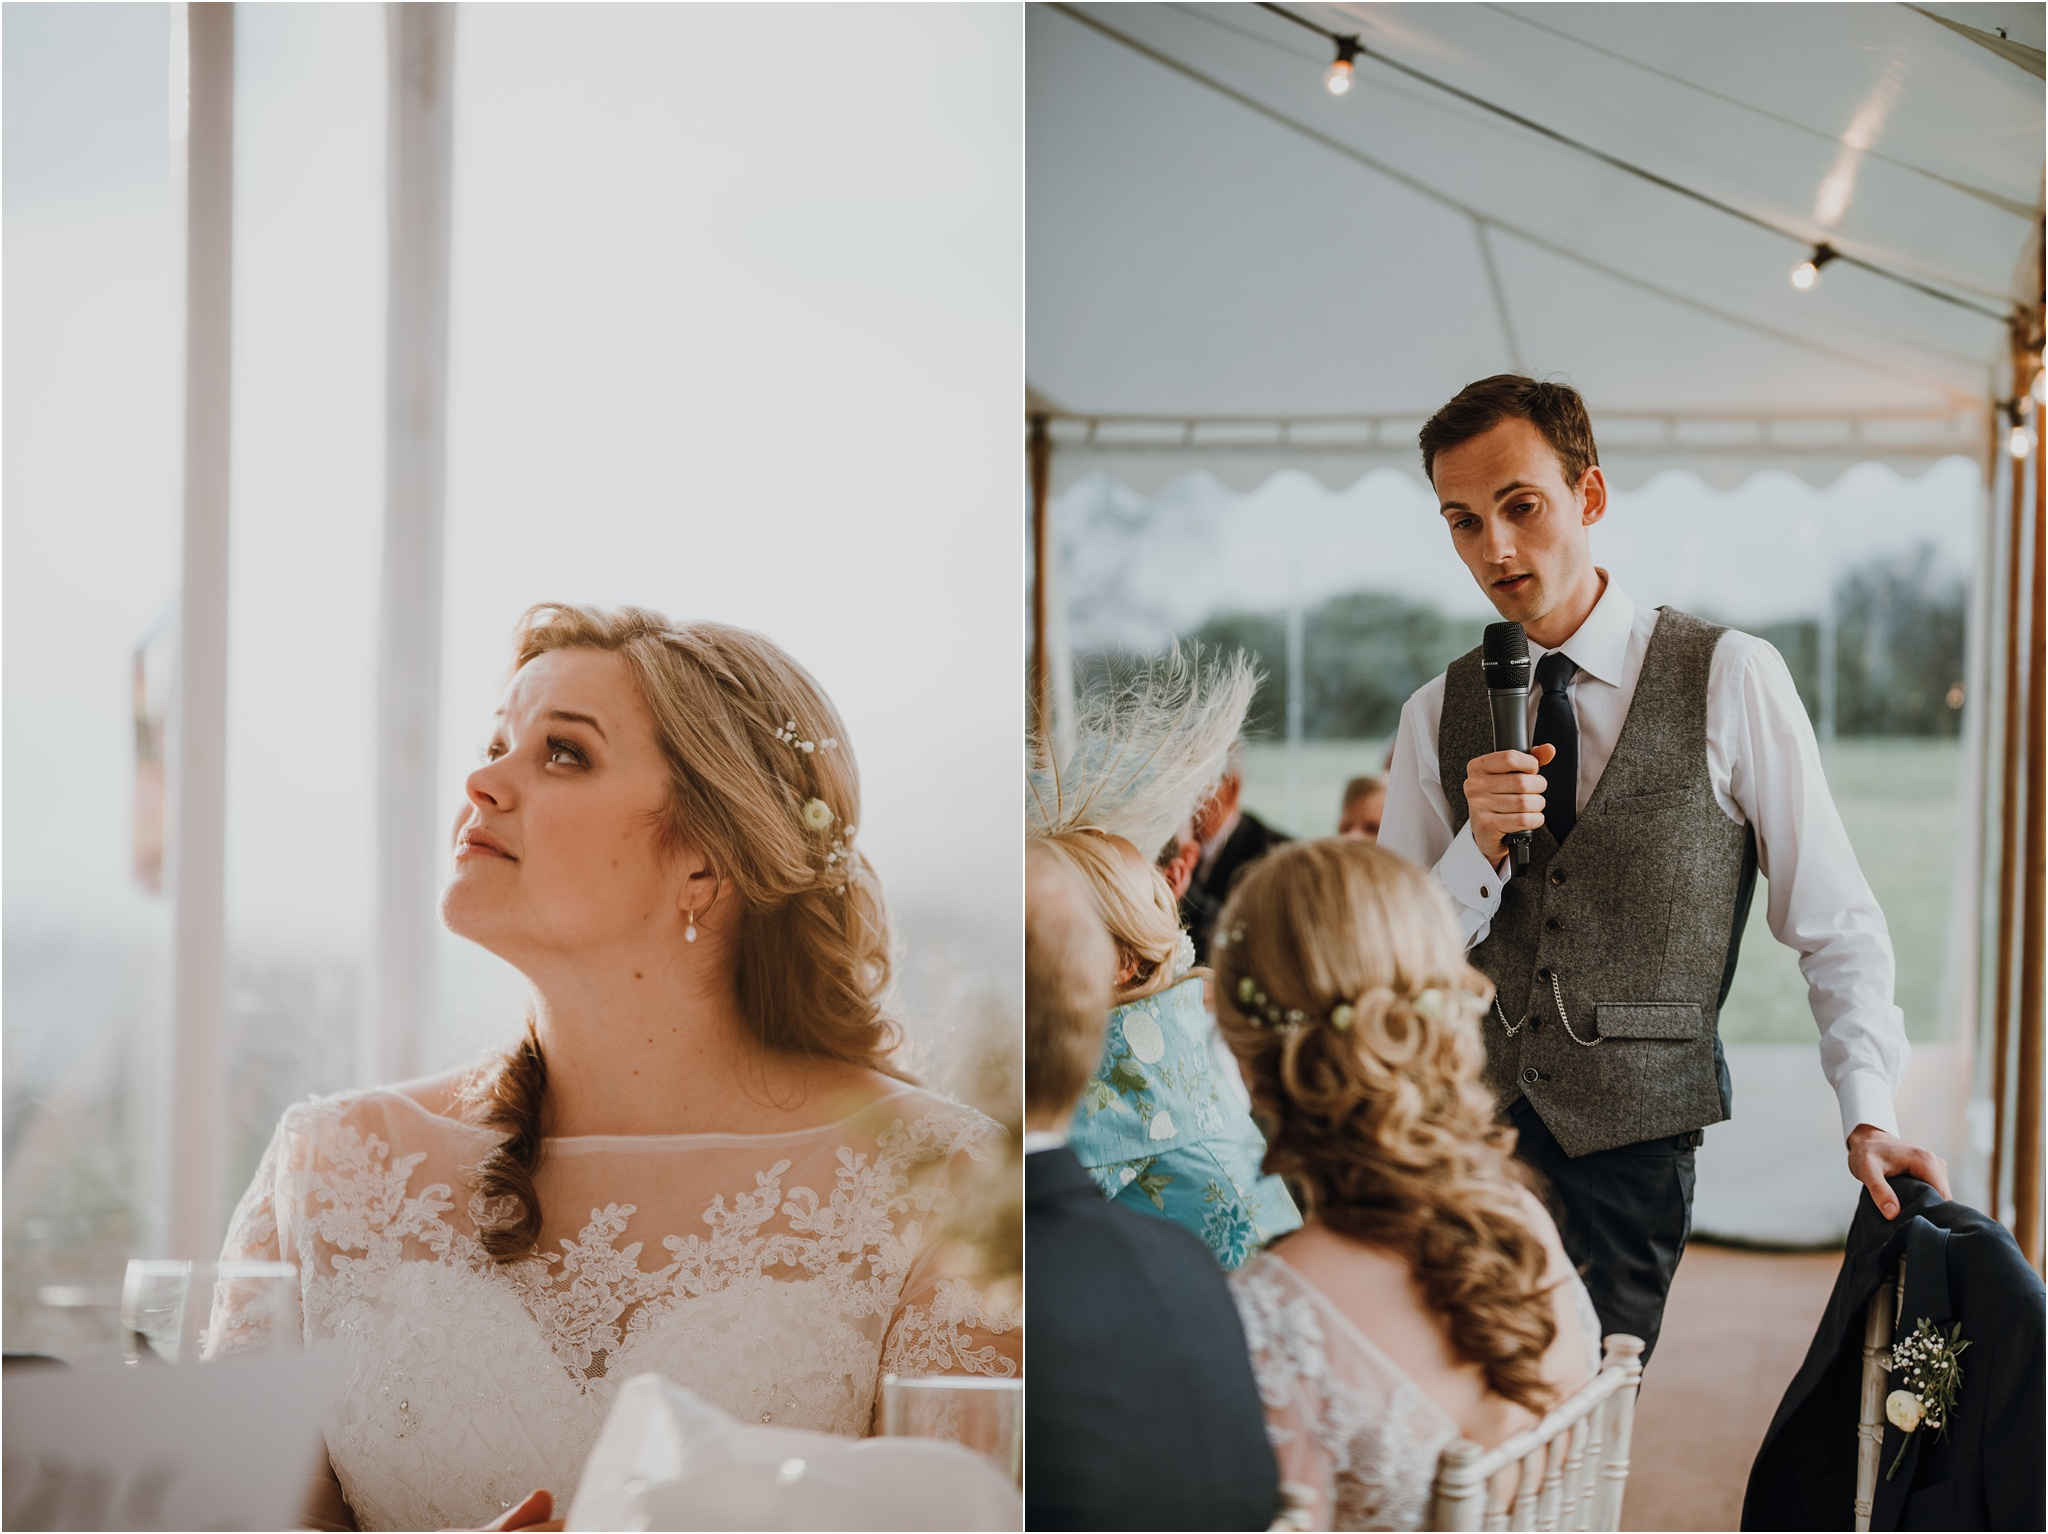 Outdoor-country-wedding-Edinburgh-photographer__0129.jpg